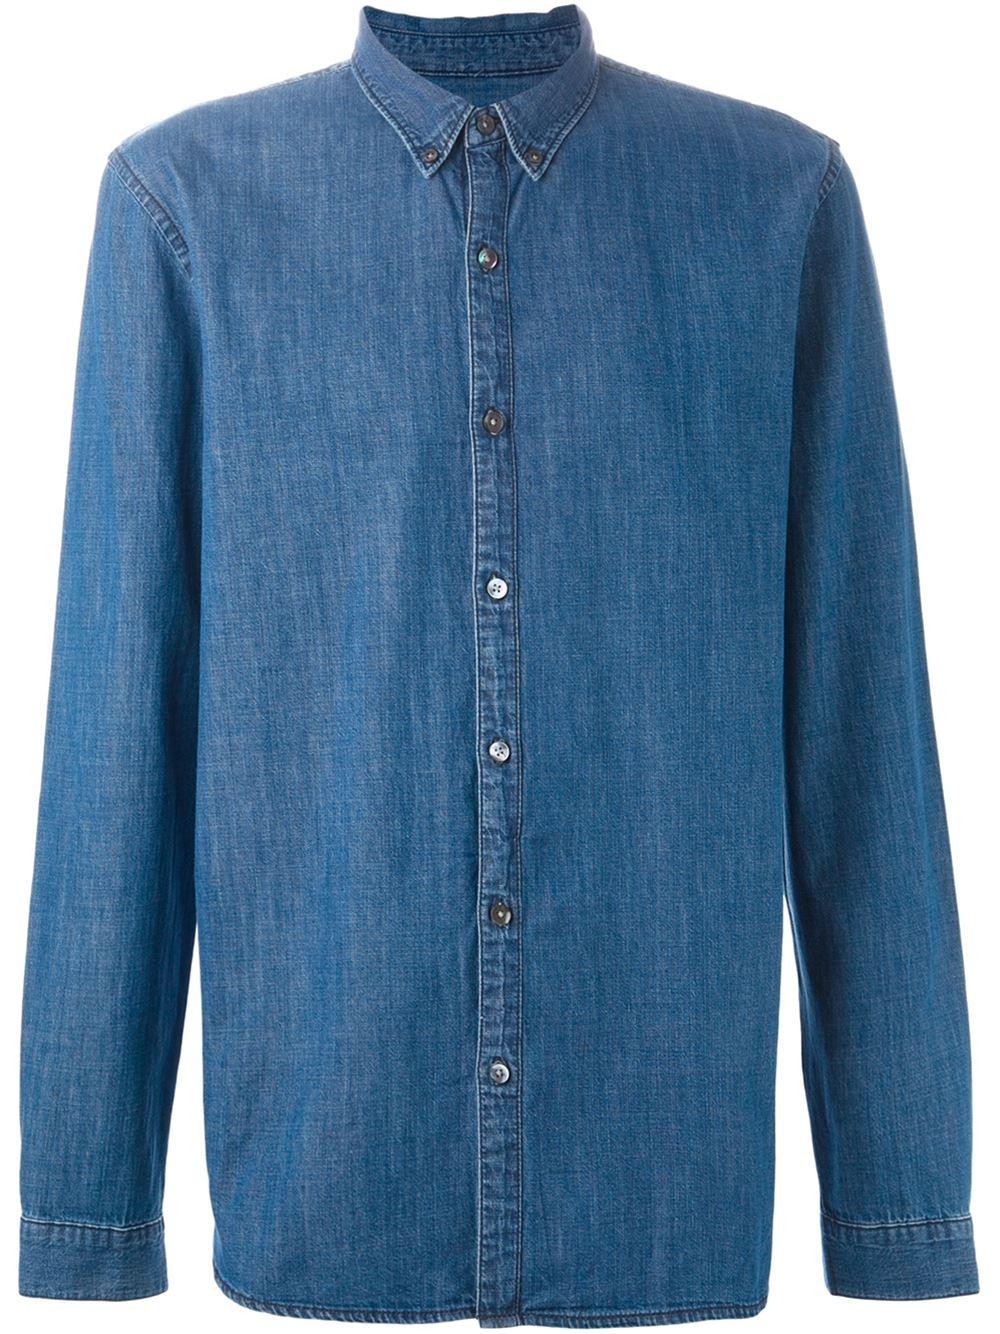 Closed Button Down Collar Denim Shirt In Blue For Men Lyst